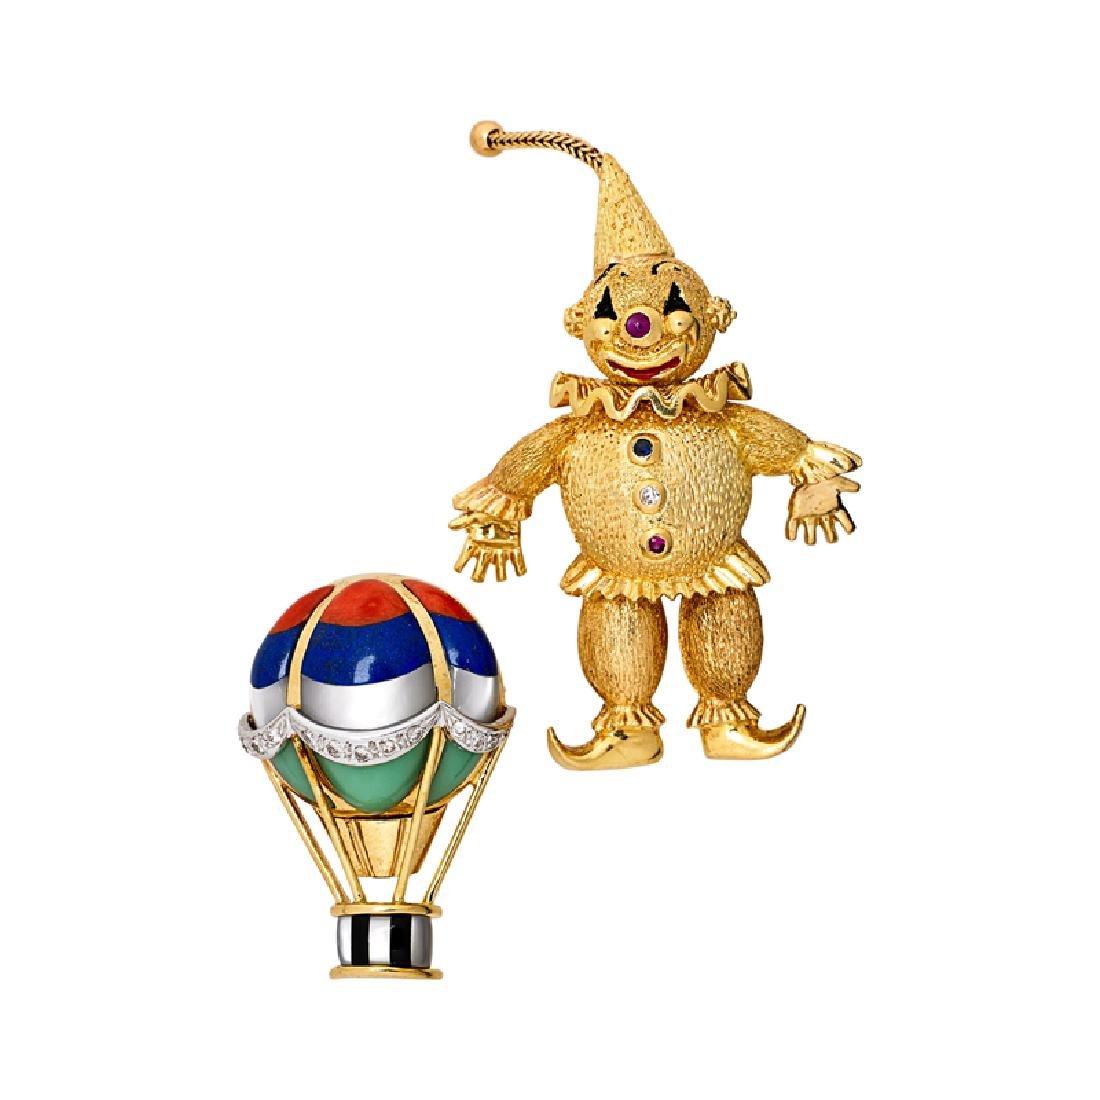 WHIMSICAL DIAMOND & GEM SET YELLOW GOLD BROOCHES